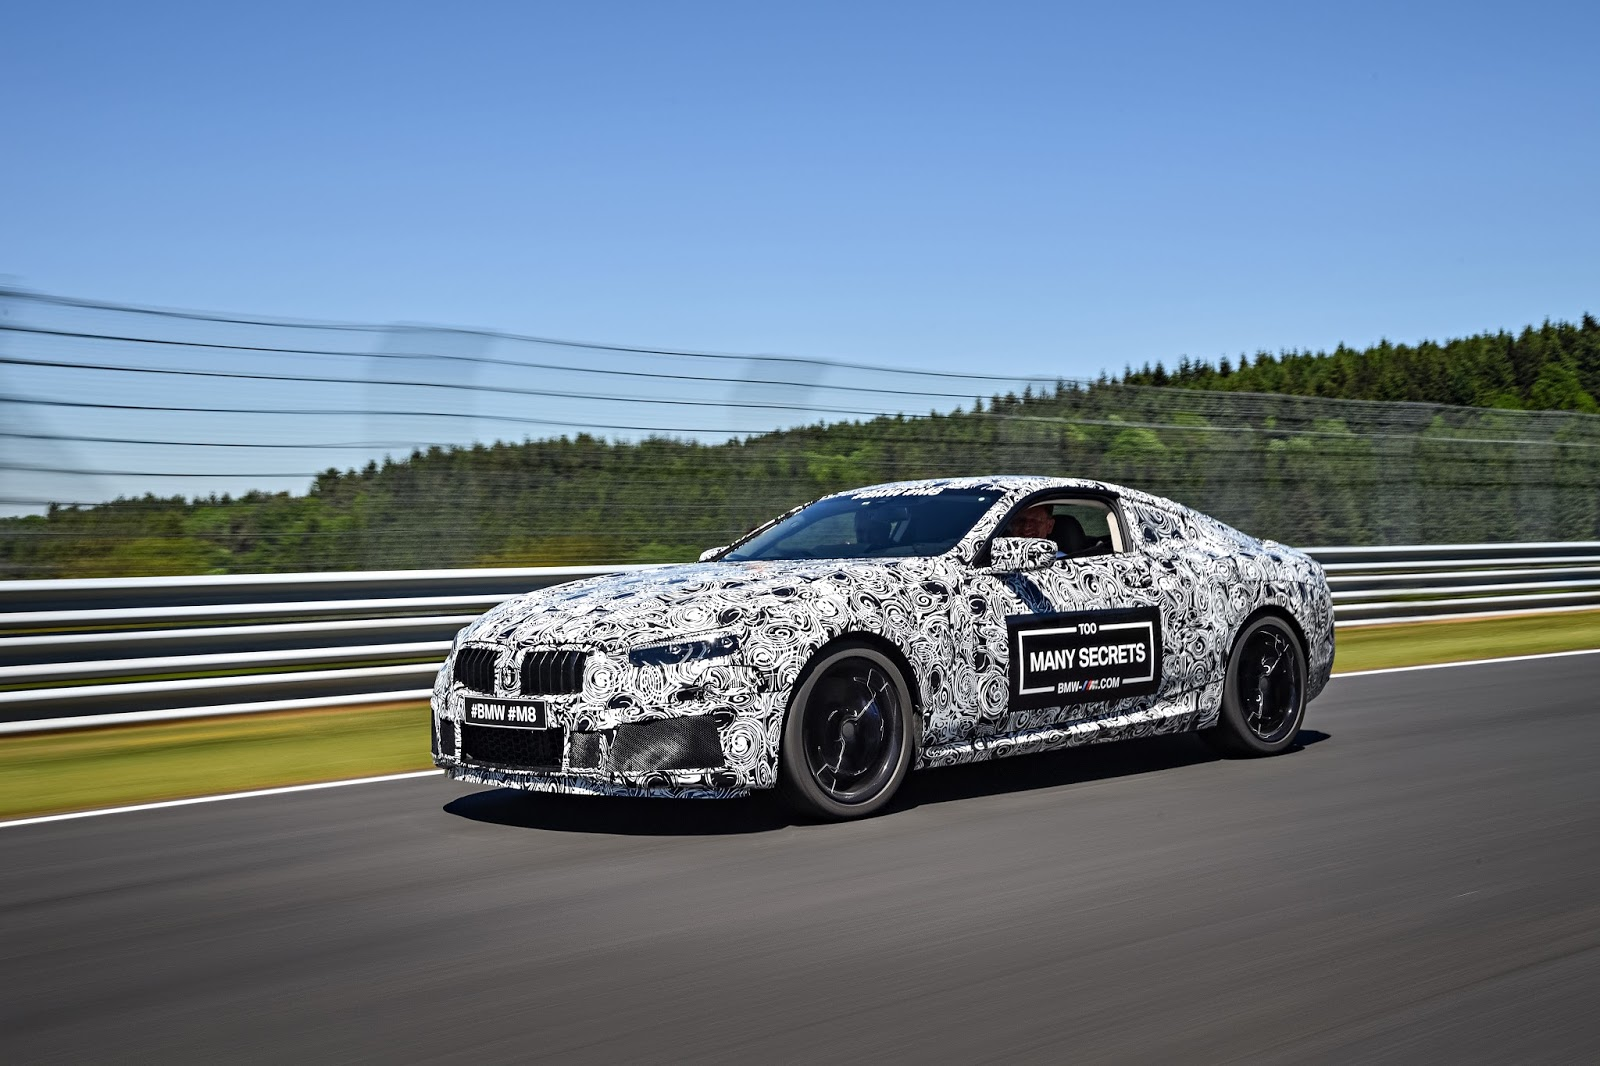 P90261538 highRes m festival bmw m8 pr H ναυαρχίδα της BMW, η M8 θα είναι οκτακύλινδρη BMW, BMW Concept, BMW Concept 8 Series, BMW M, BMW M Performance, BMW M8